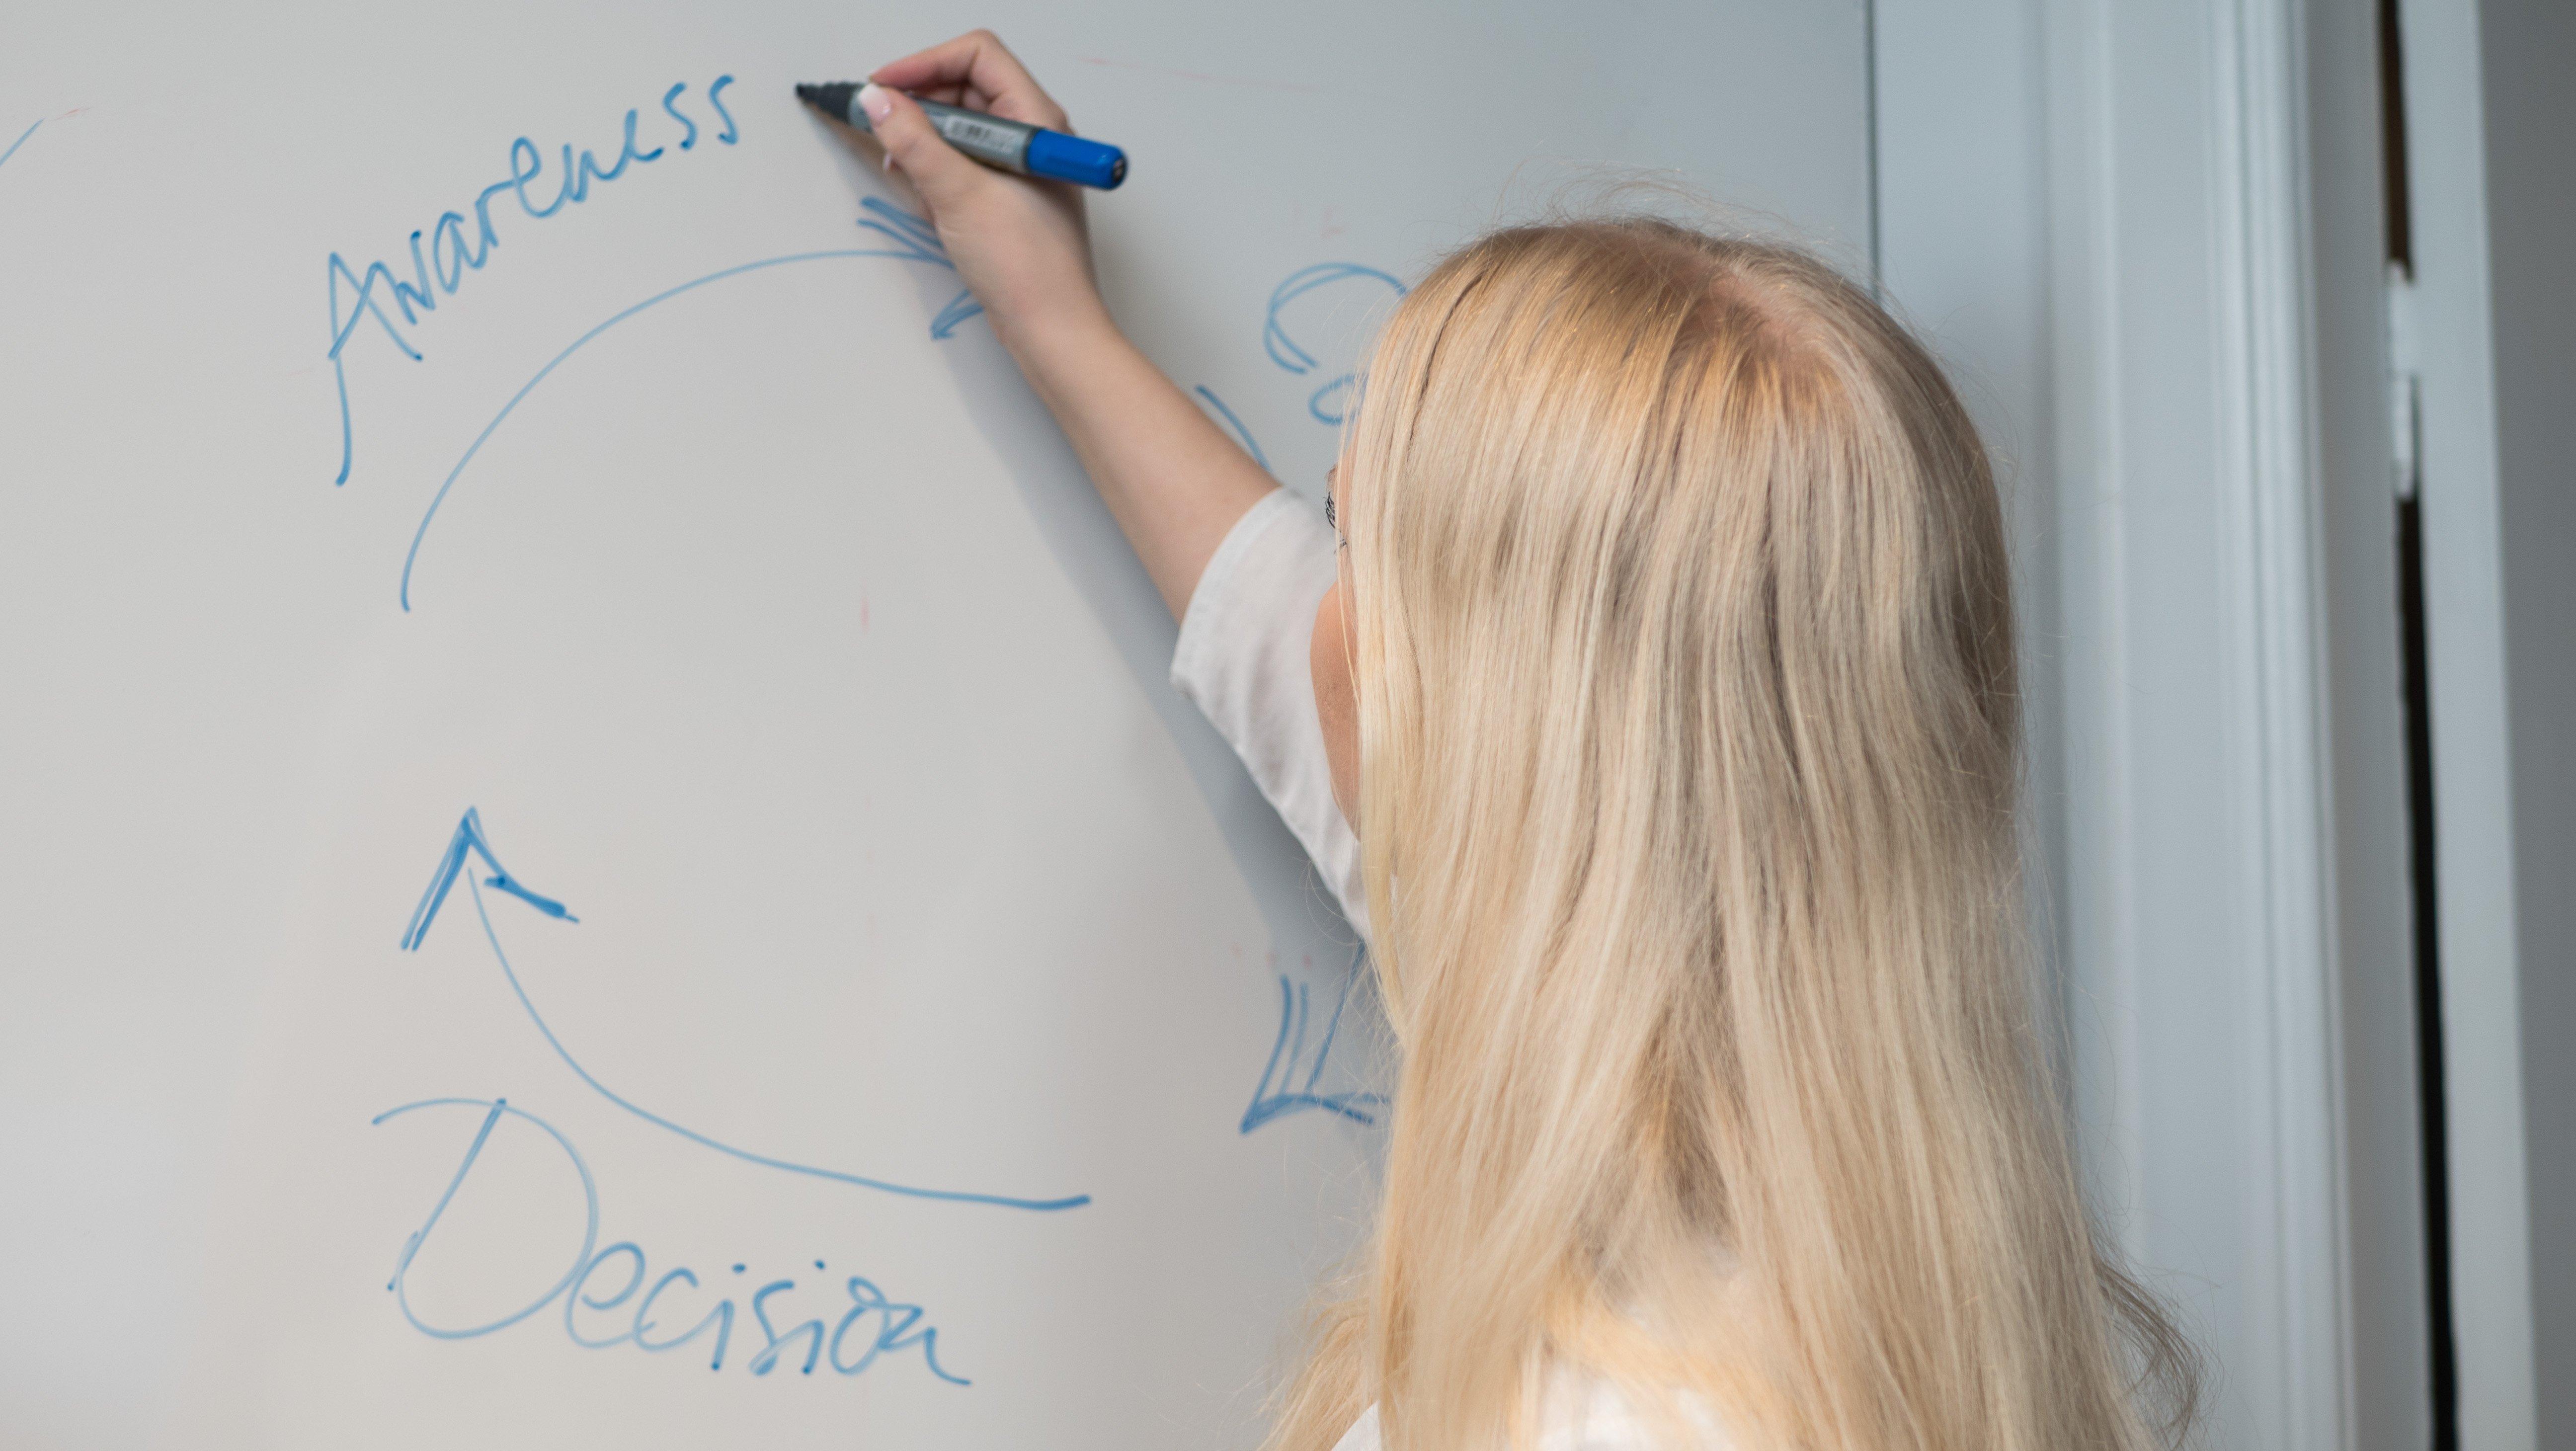 Matilda illustrates the buyer's journey